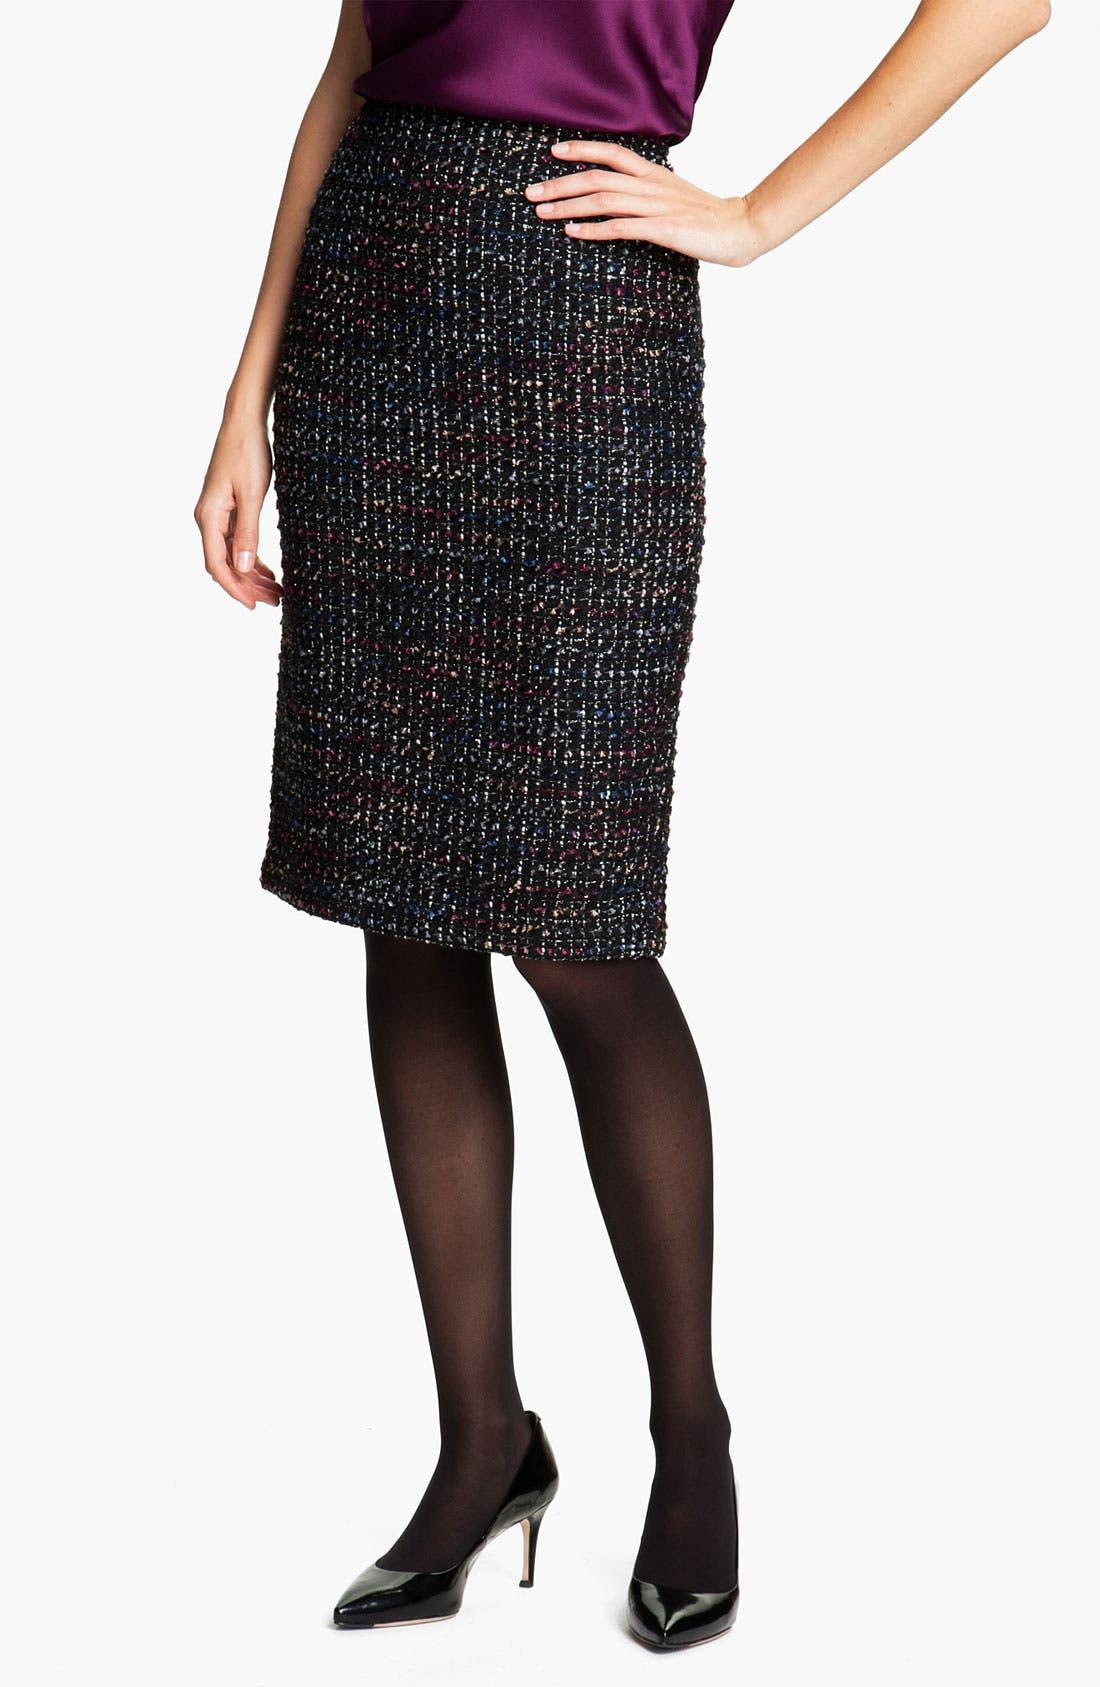 Alternate Image 1 Selected - Lafayette 148 New York 'Cambria Tweed' Slim Skirt